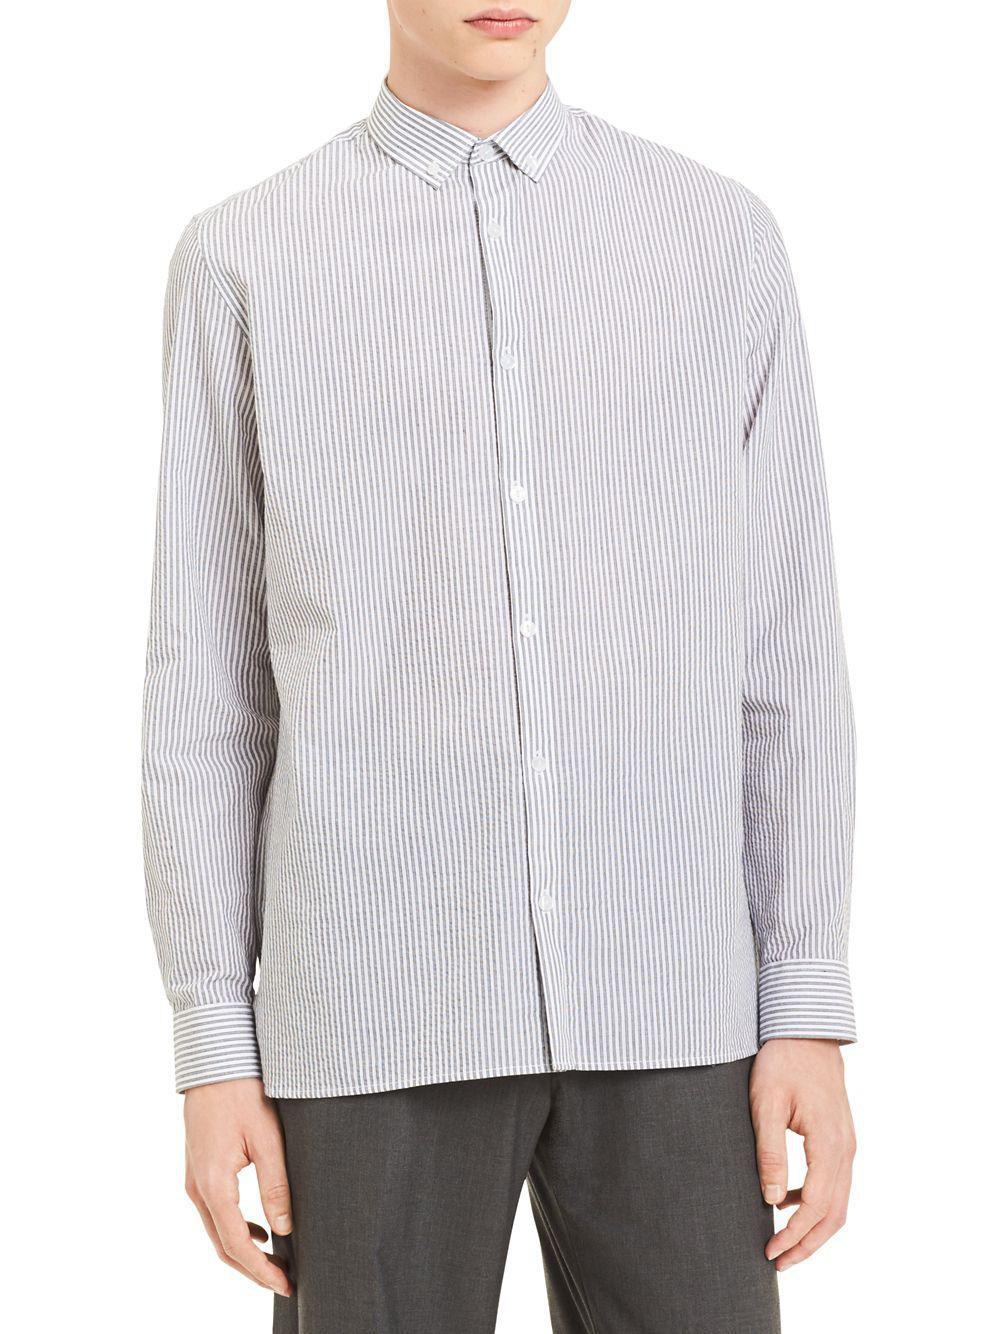 8b0bacdbc41 Lyst - Calvin Klein Yarn-dye Seersucker Dobby Stripe Shirt in White ...